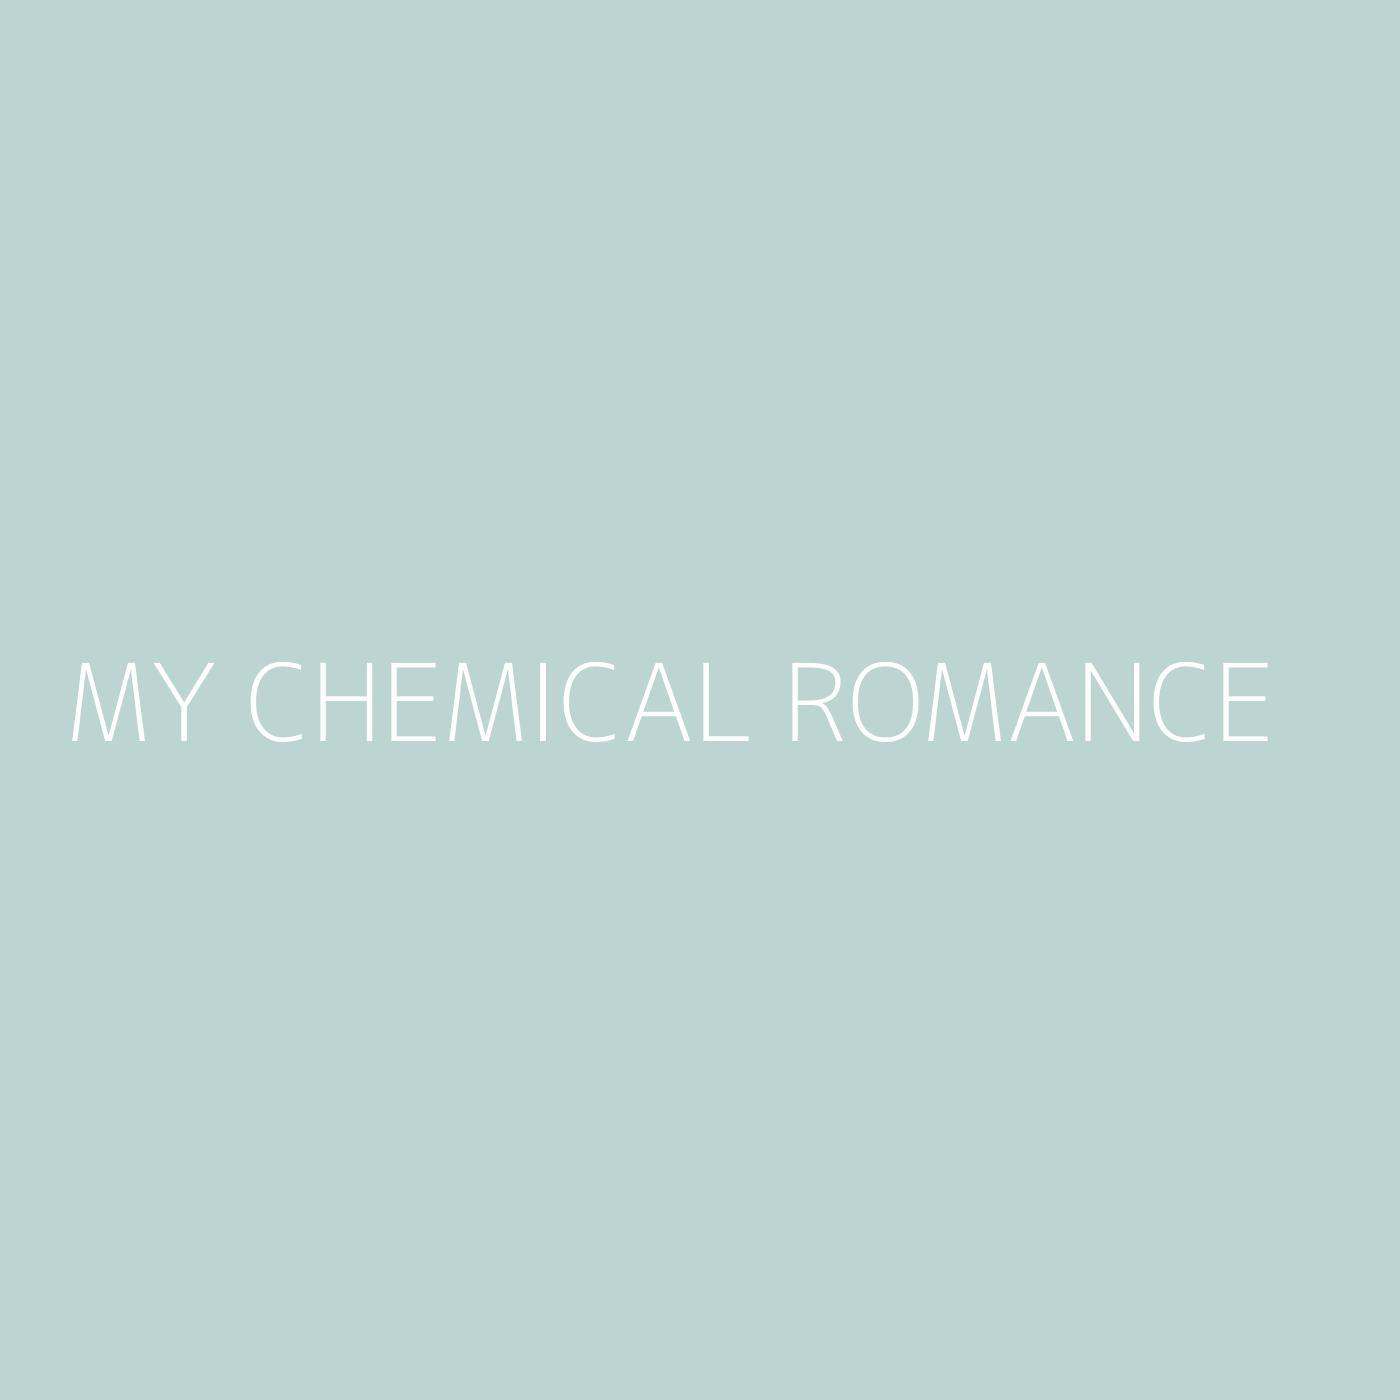 My Chemical Romance Playlist Artwork